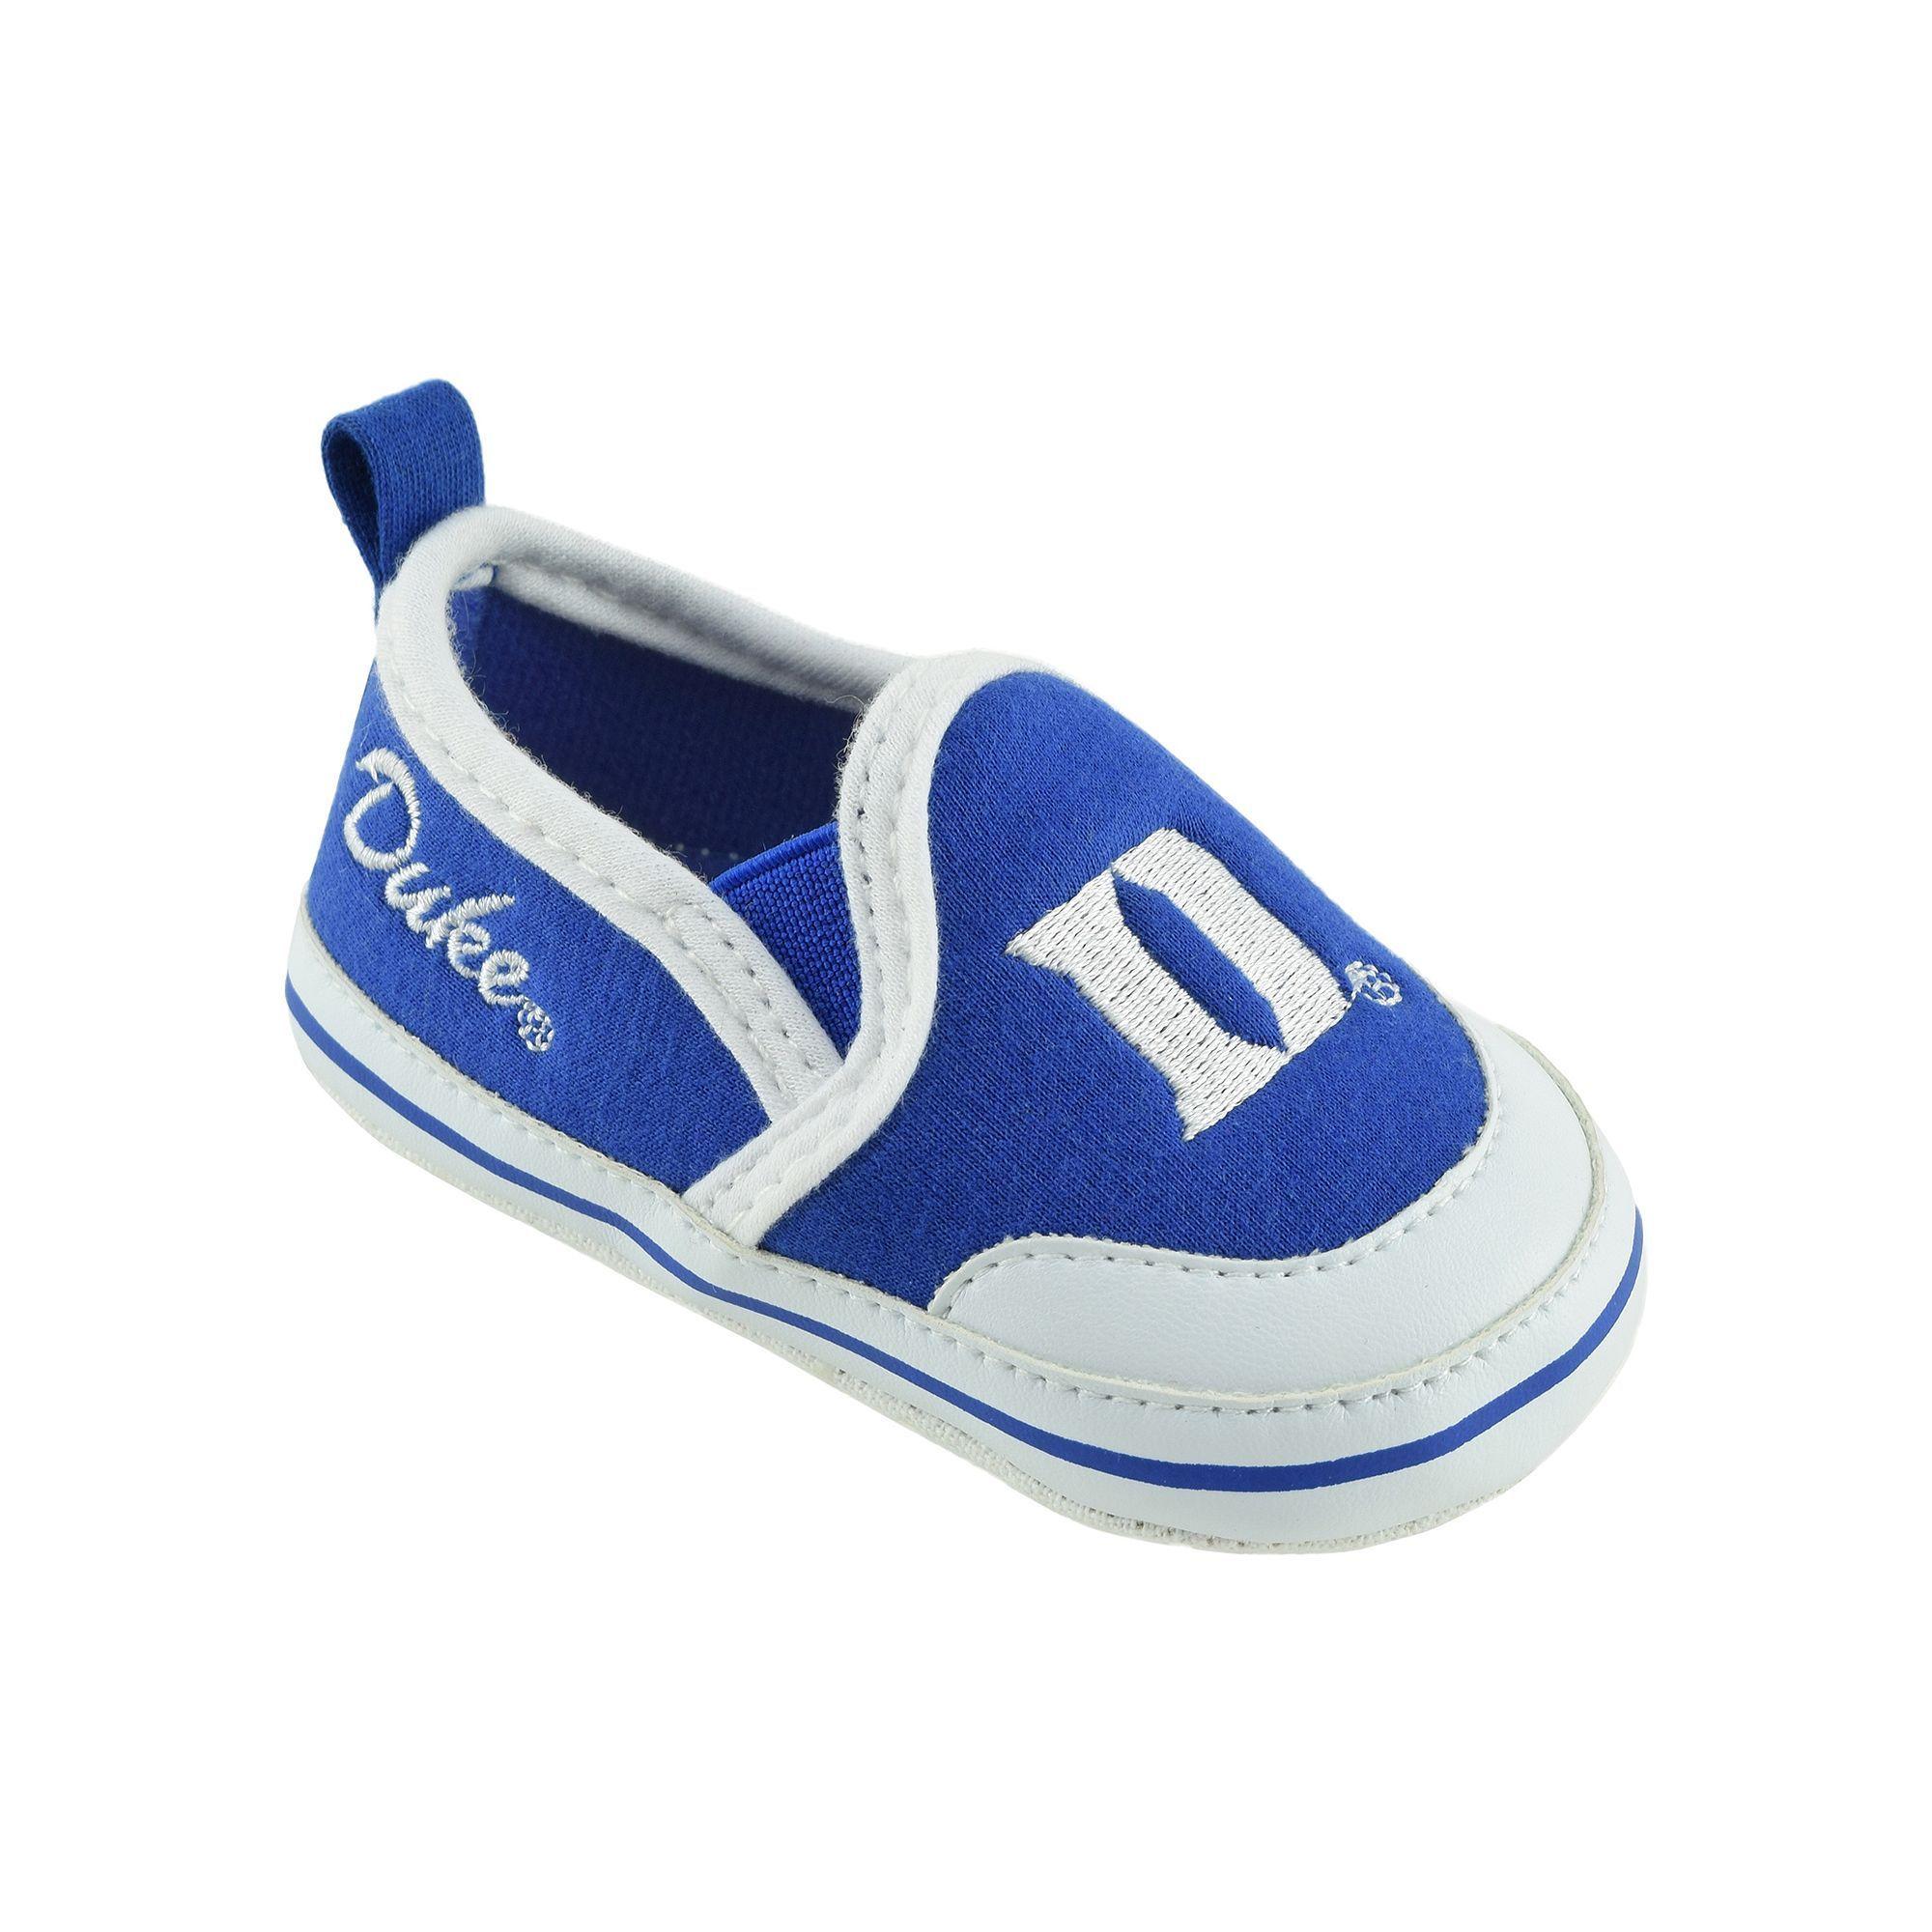 Kohl s Duke University Blue Devils NCAA Crib Shoes Baby